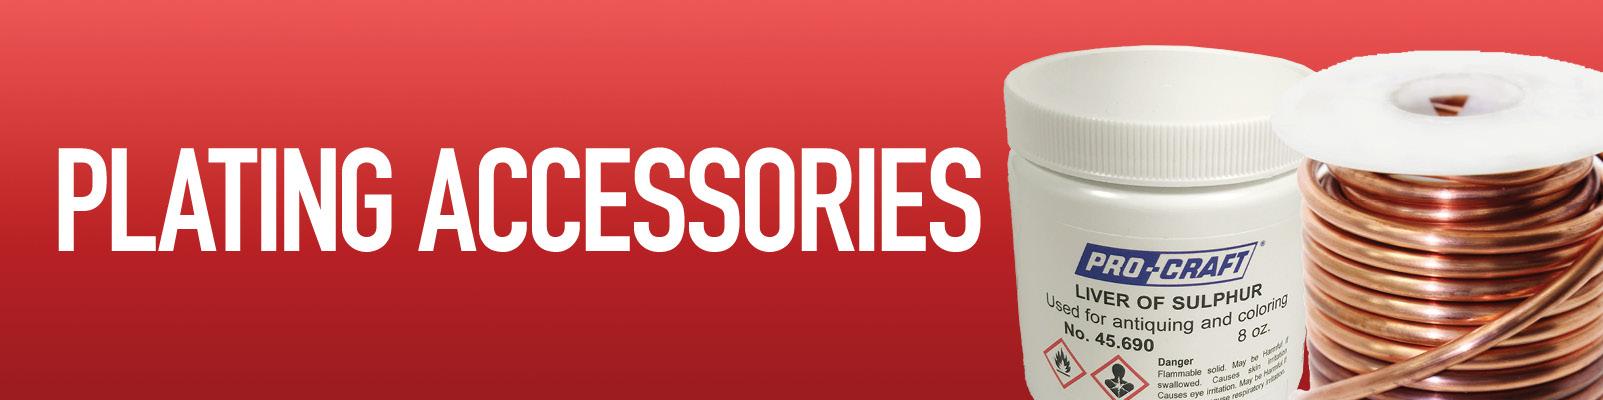 Plating Accessories